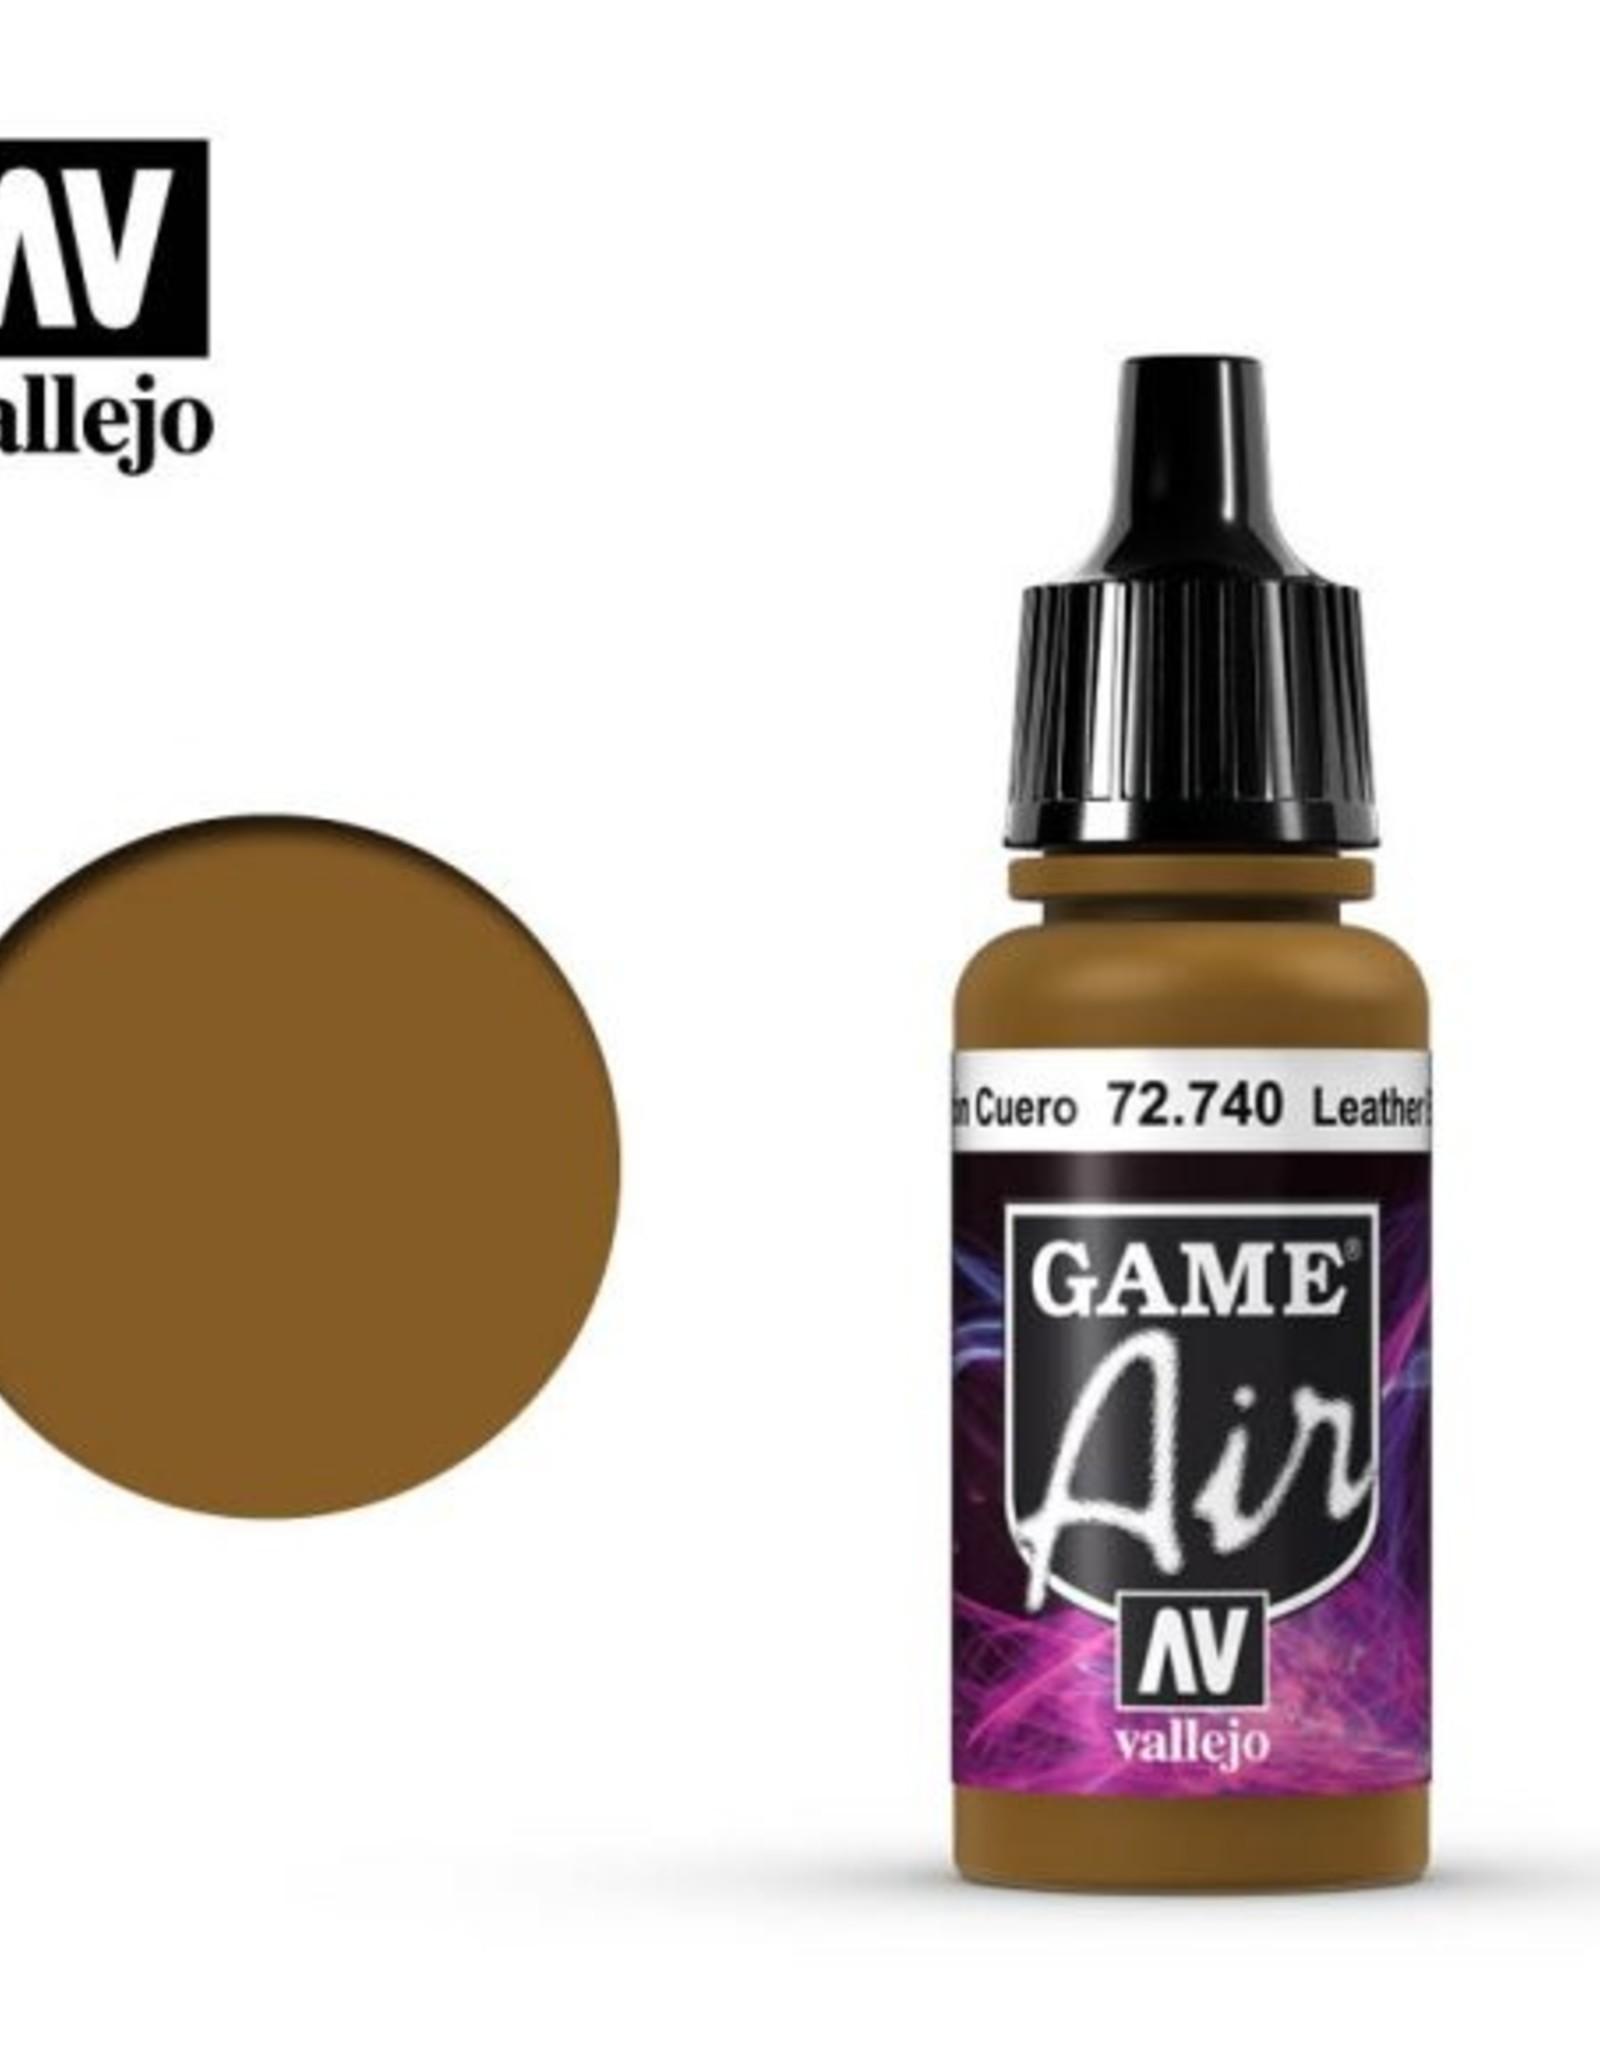 Vallejo Game Air: 72.740 Cobra Leather